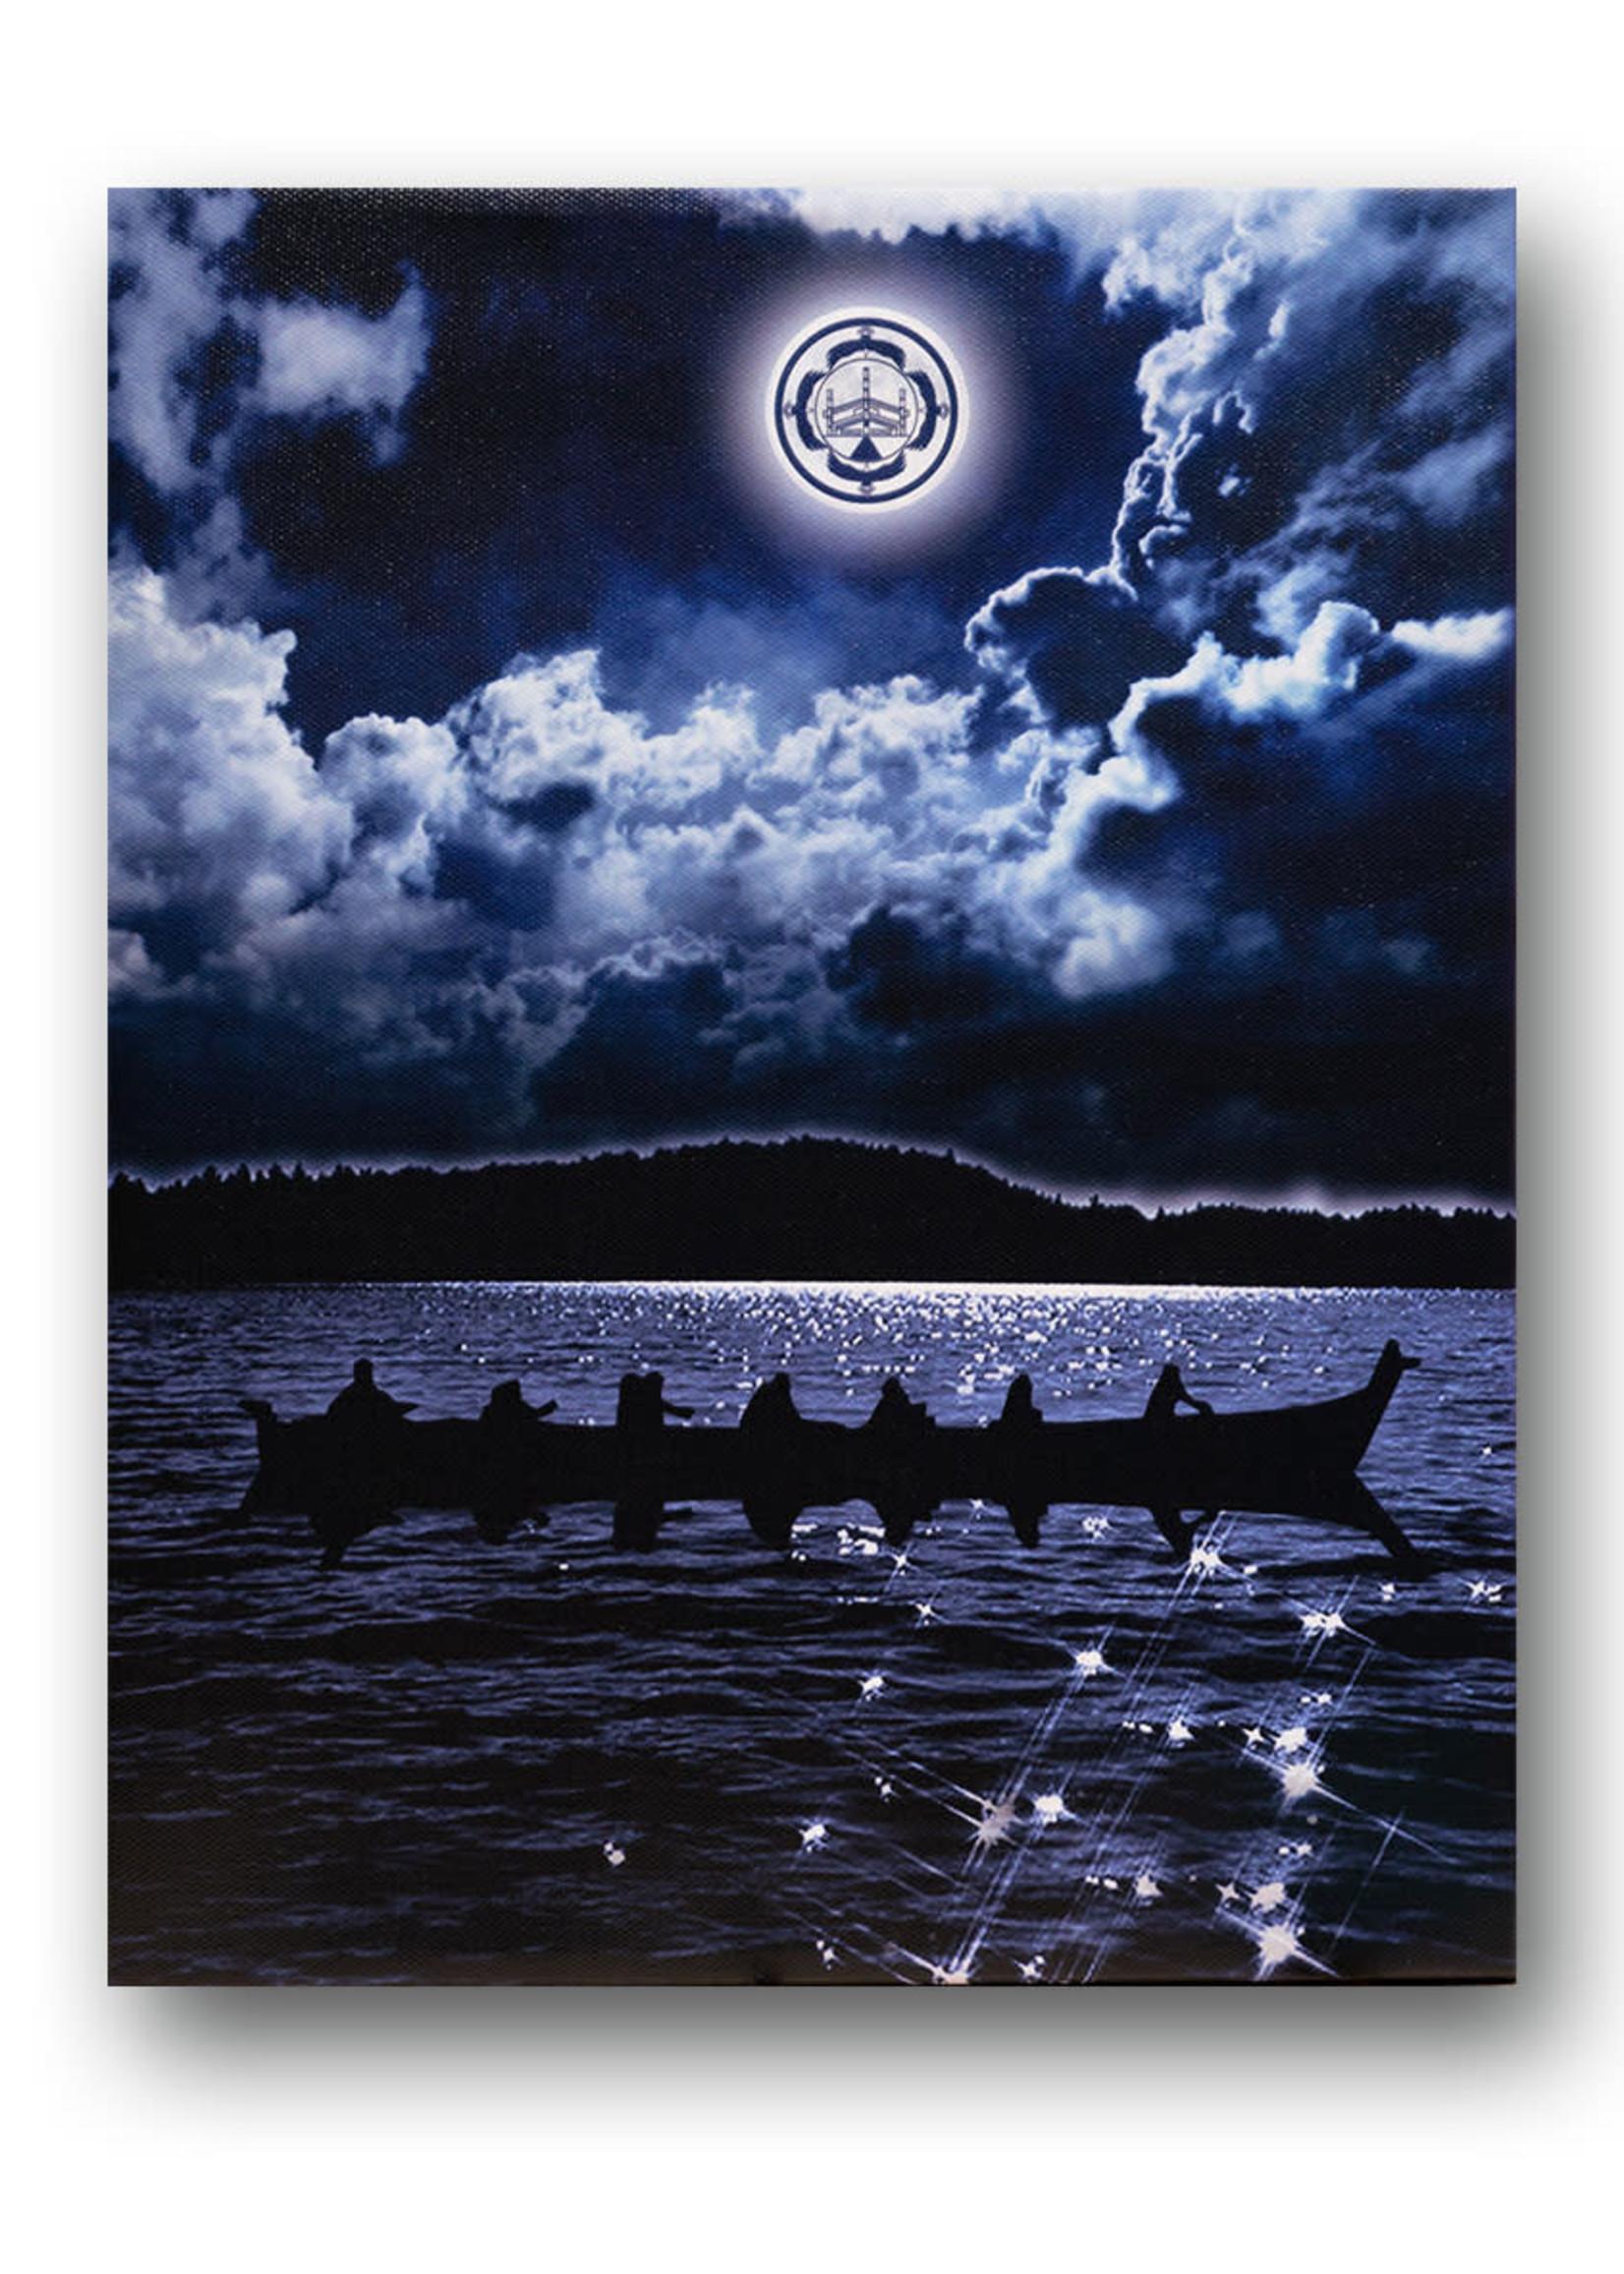 Circle of Eagles Kwa Kwem Tn by Moonlight Canvas 11x14